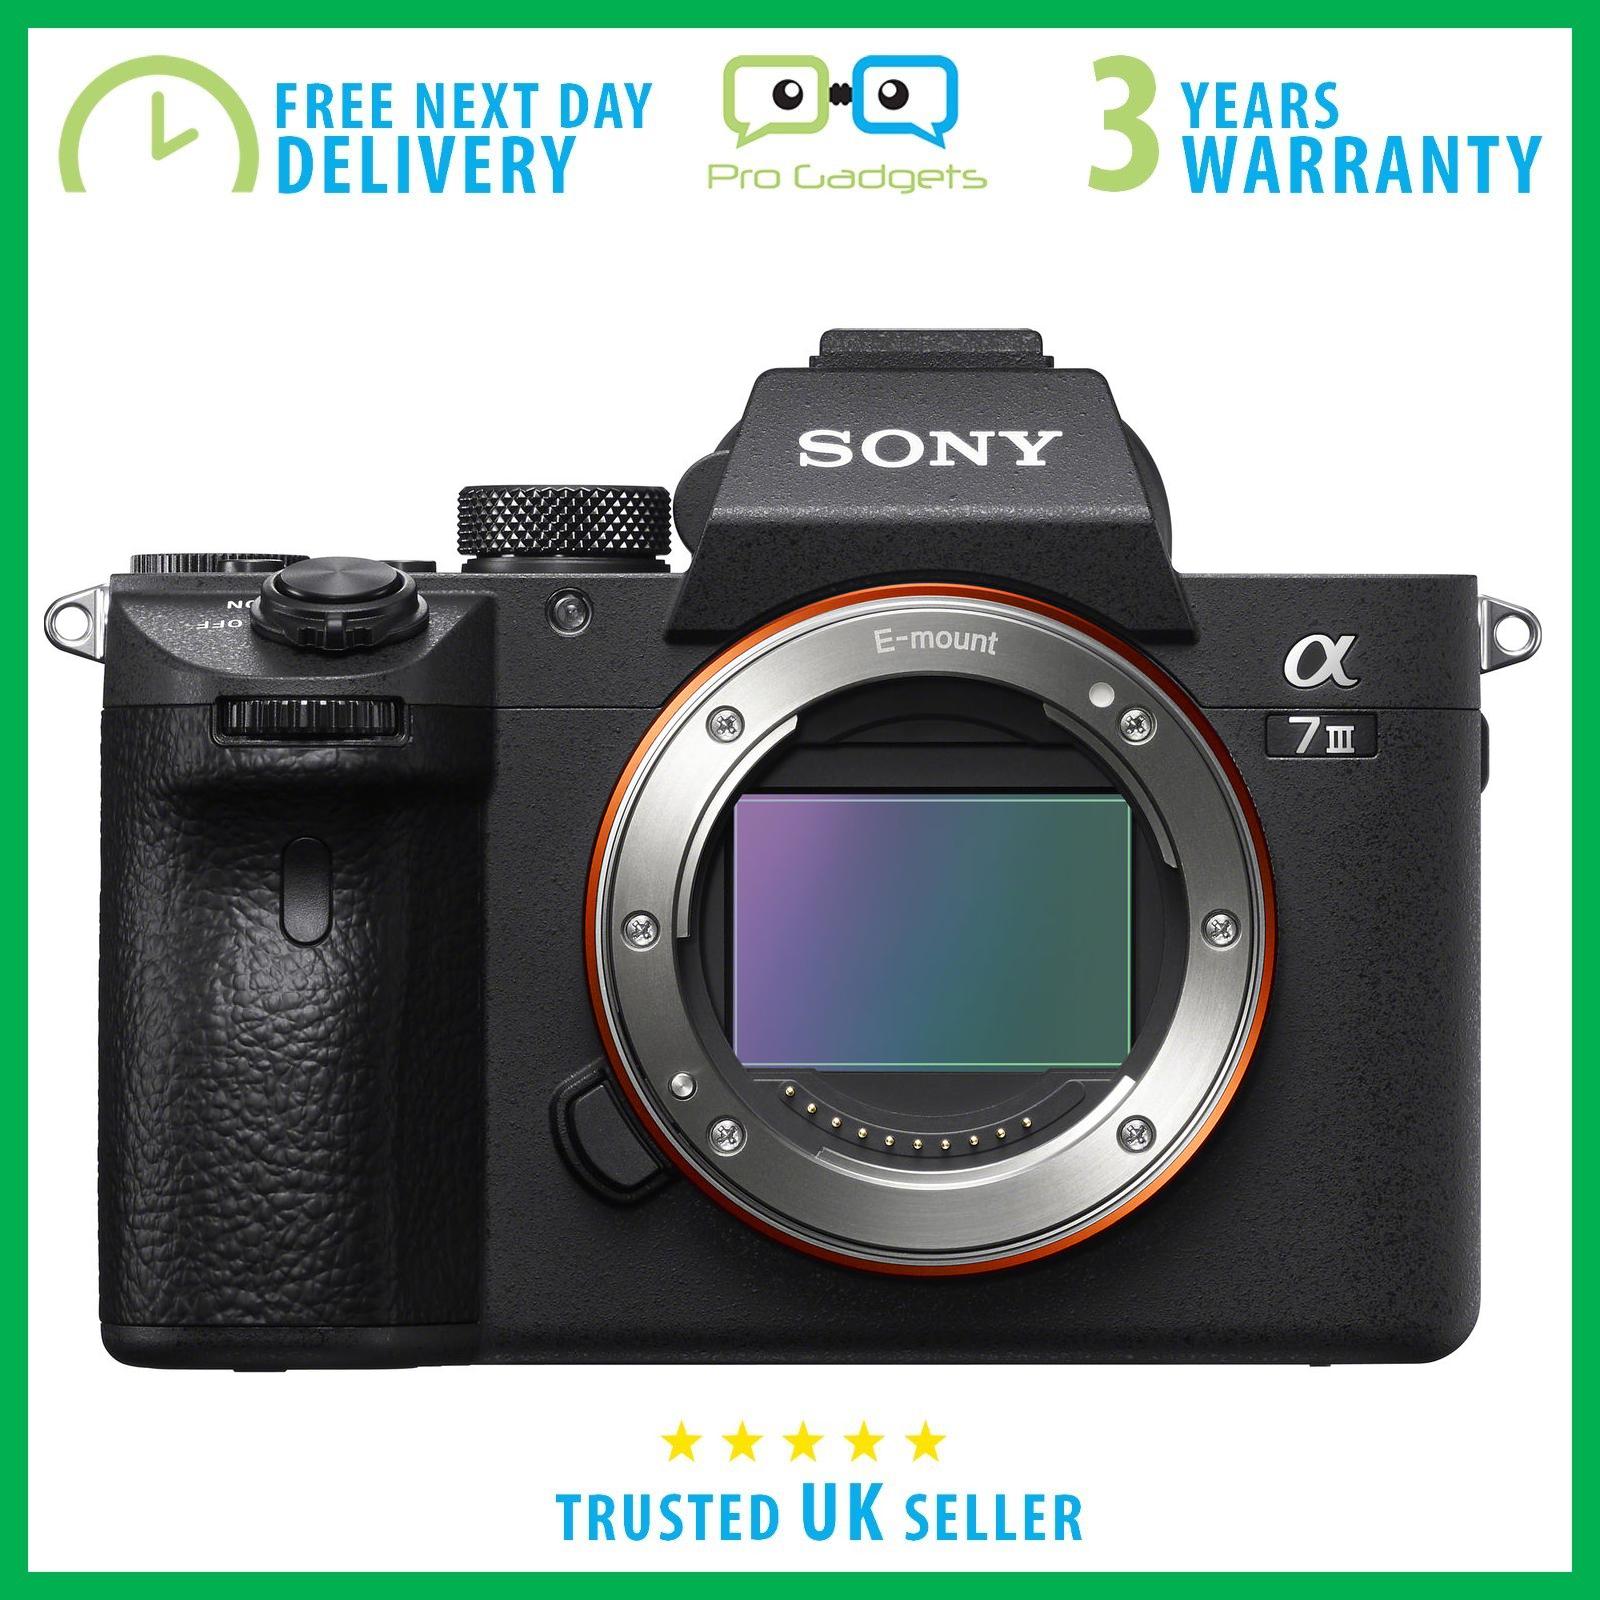 New Sony Alpha a7 III Mirrorless Digital Camera A7III ILCE7M3 - 3 Year Warranty